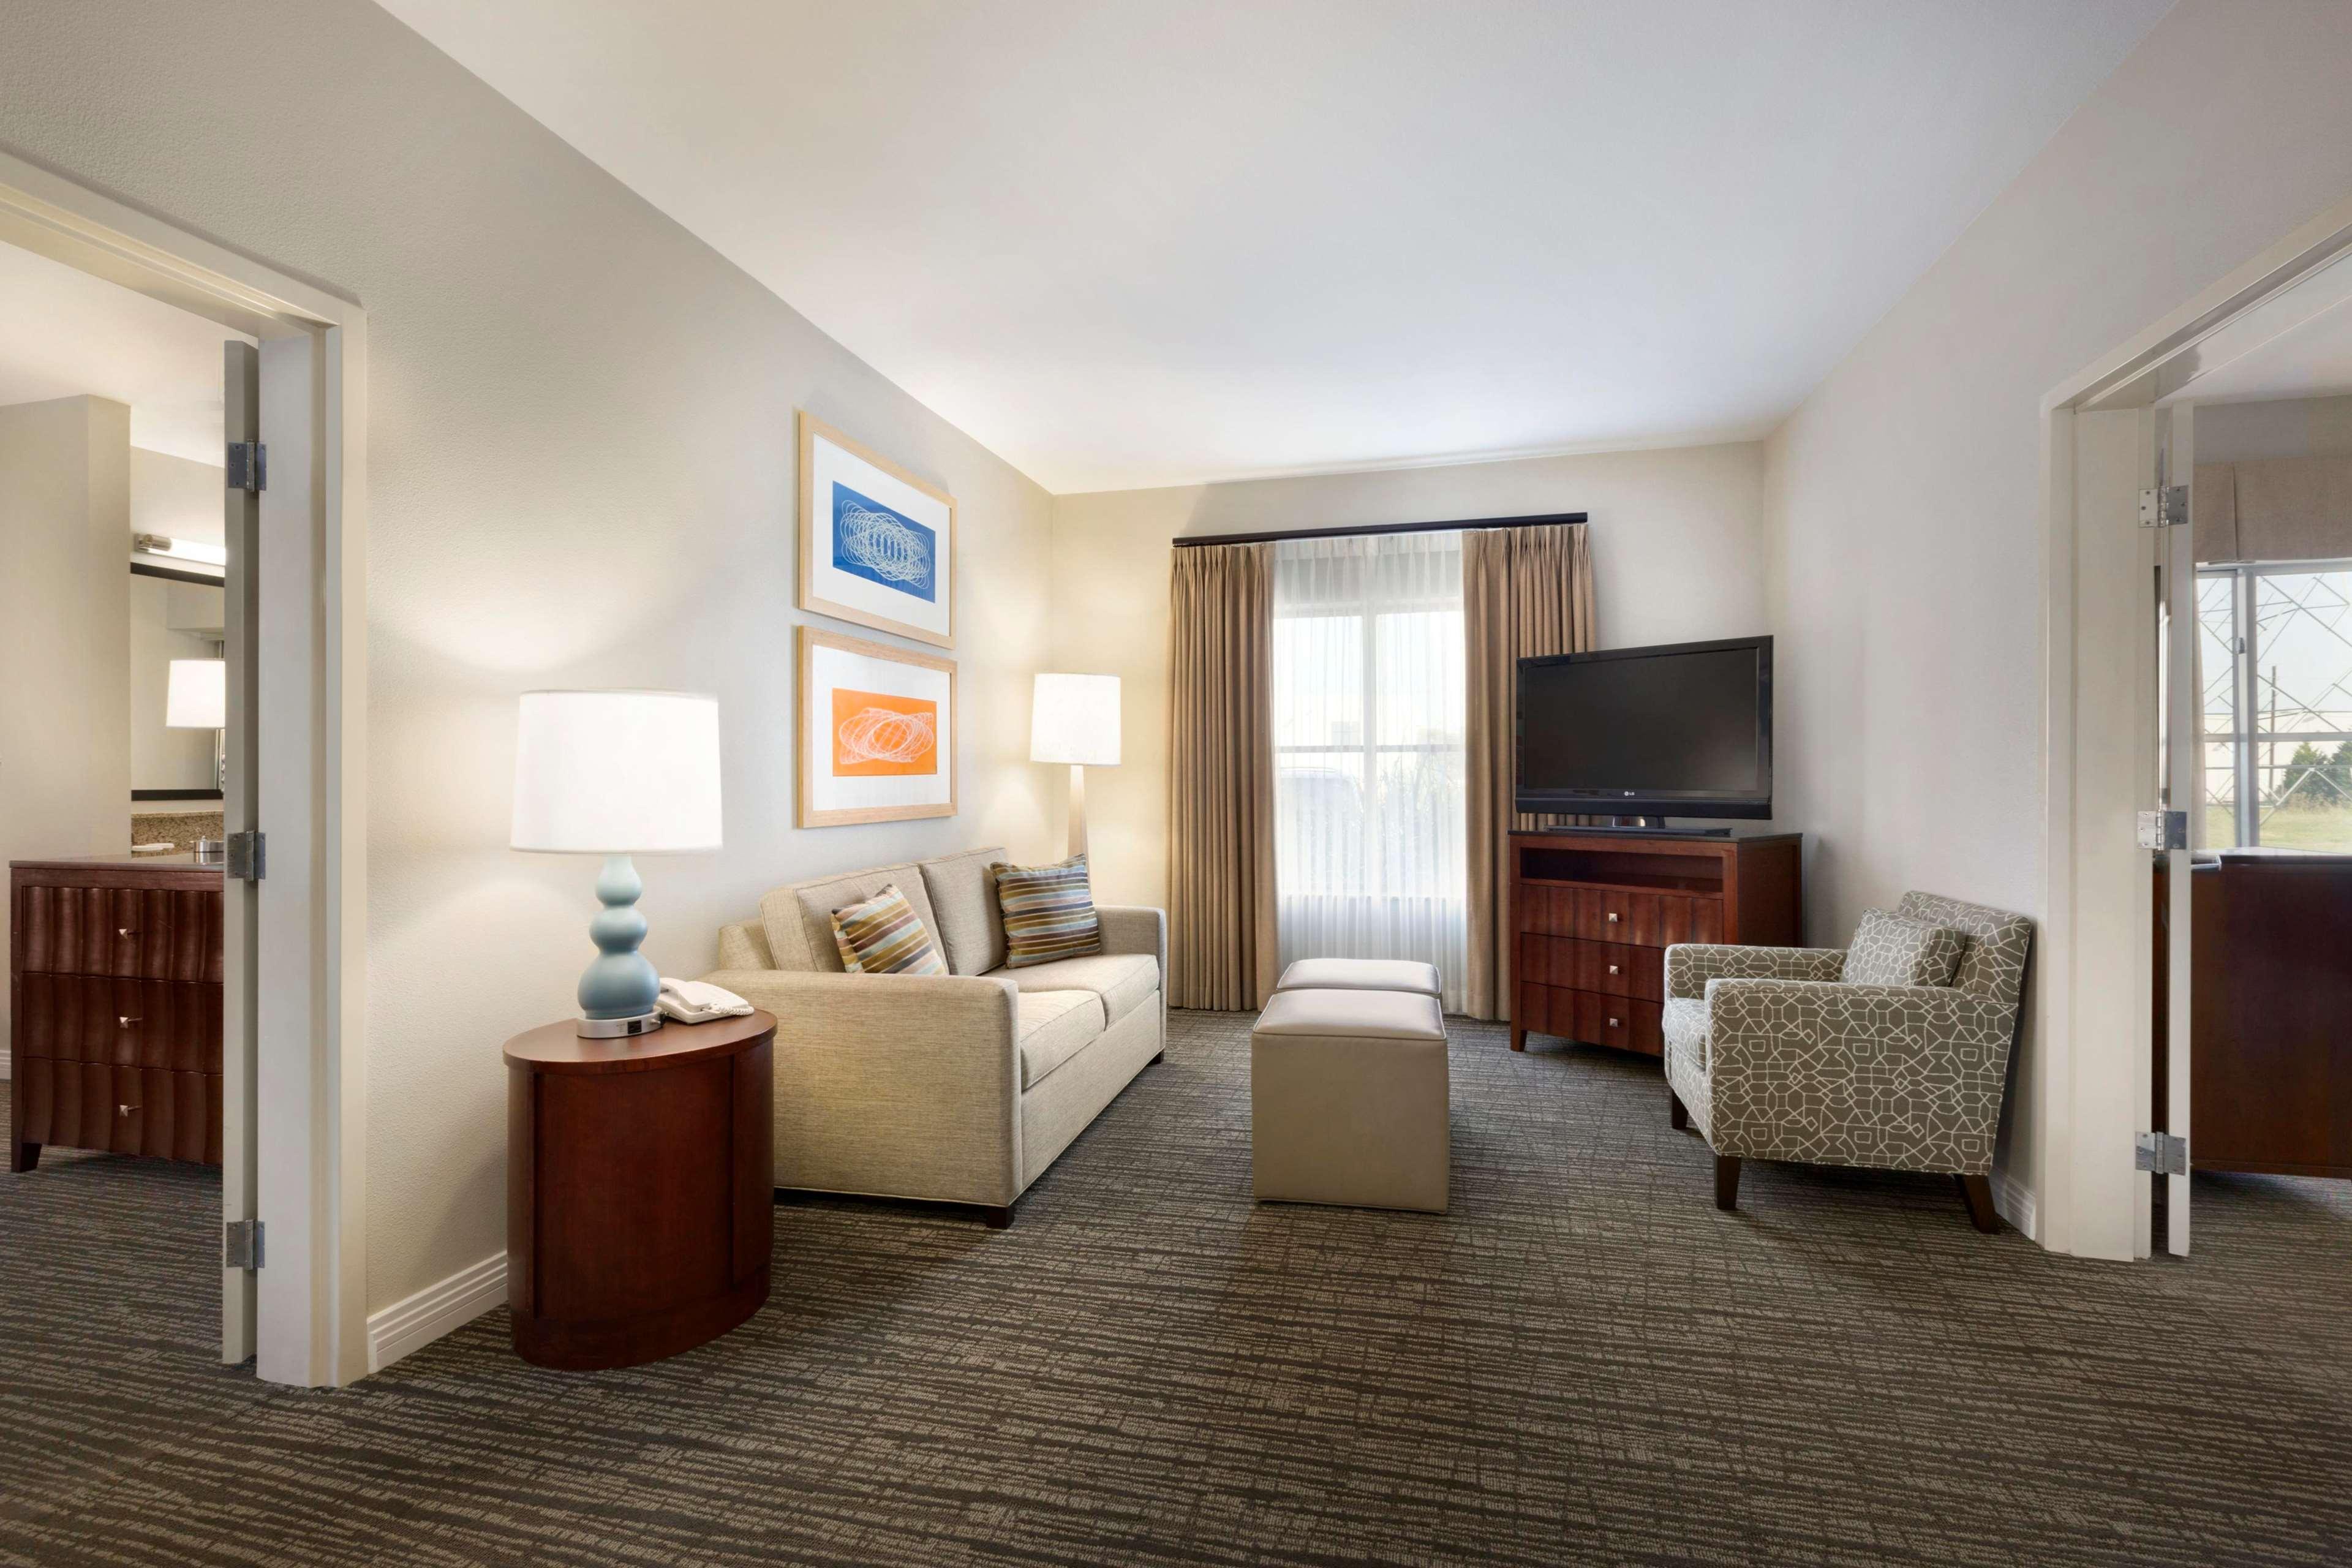 Homewood Suites by Hilton Plano-Richardson image 9